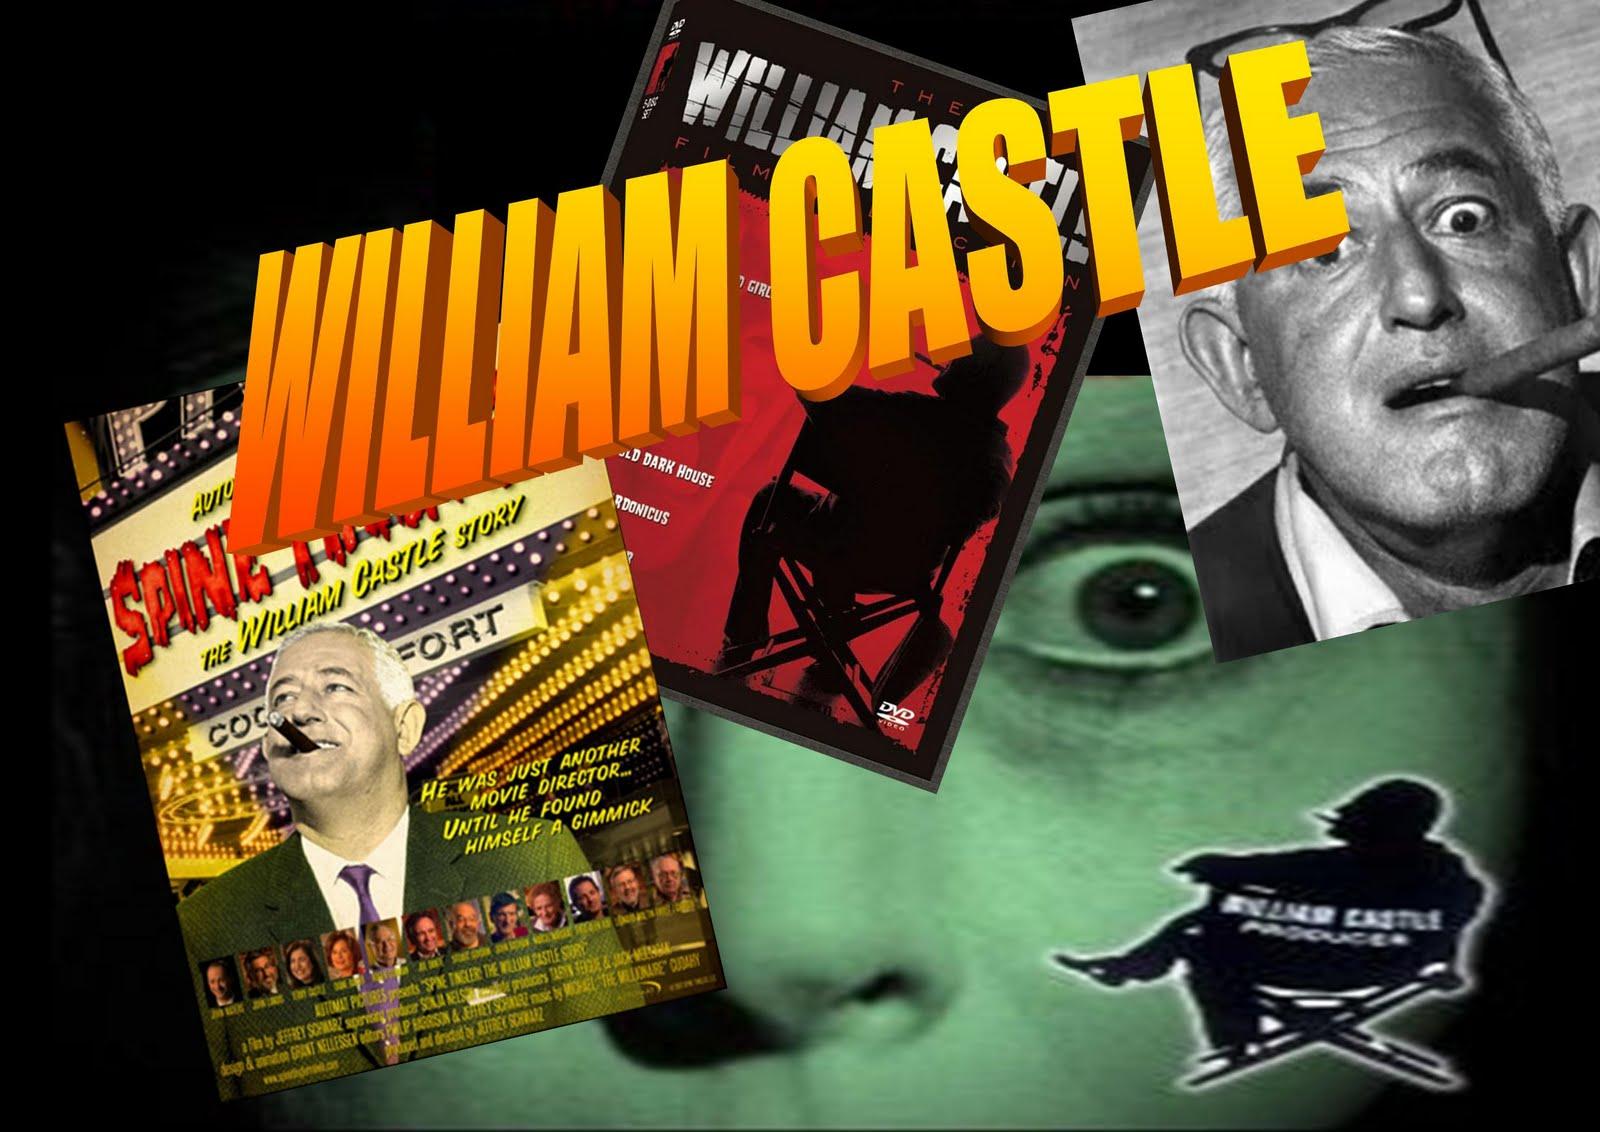 http://1.bp.blogspot.com/_aqCjiYQXKAU/TUNLm5NA34I/AAAAAAAAB6M/20CI_Pn8tS0/s1600/william%2Bcastle%2Bstephen%2Bking.jpg